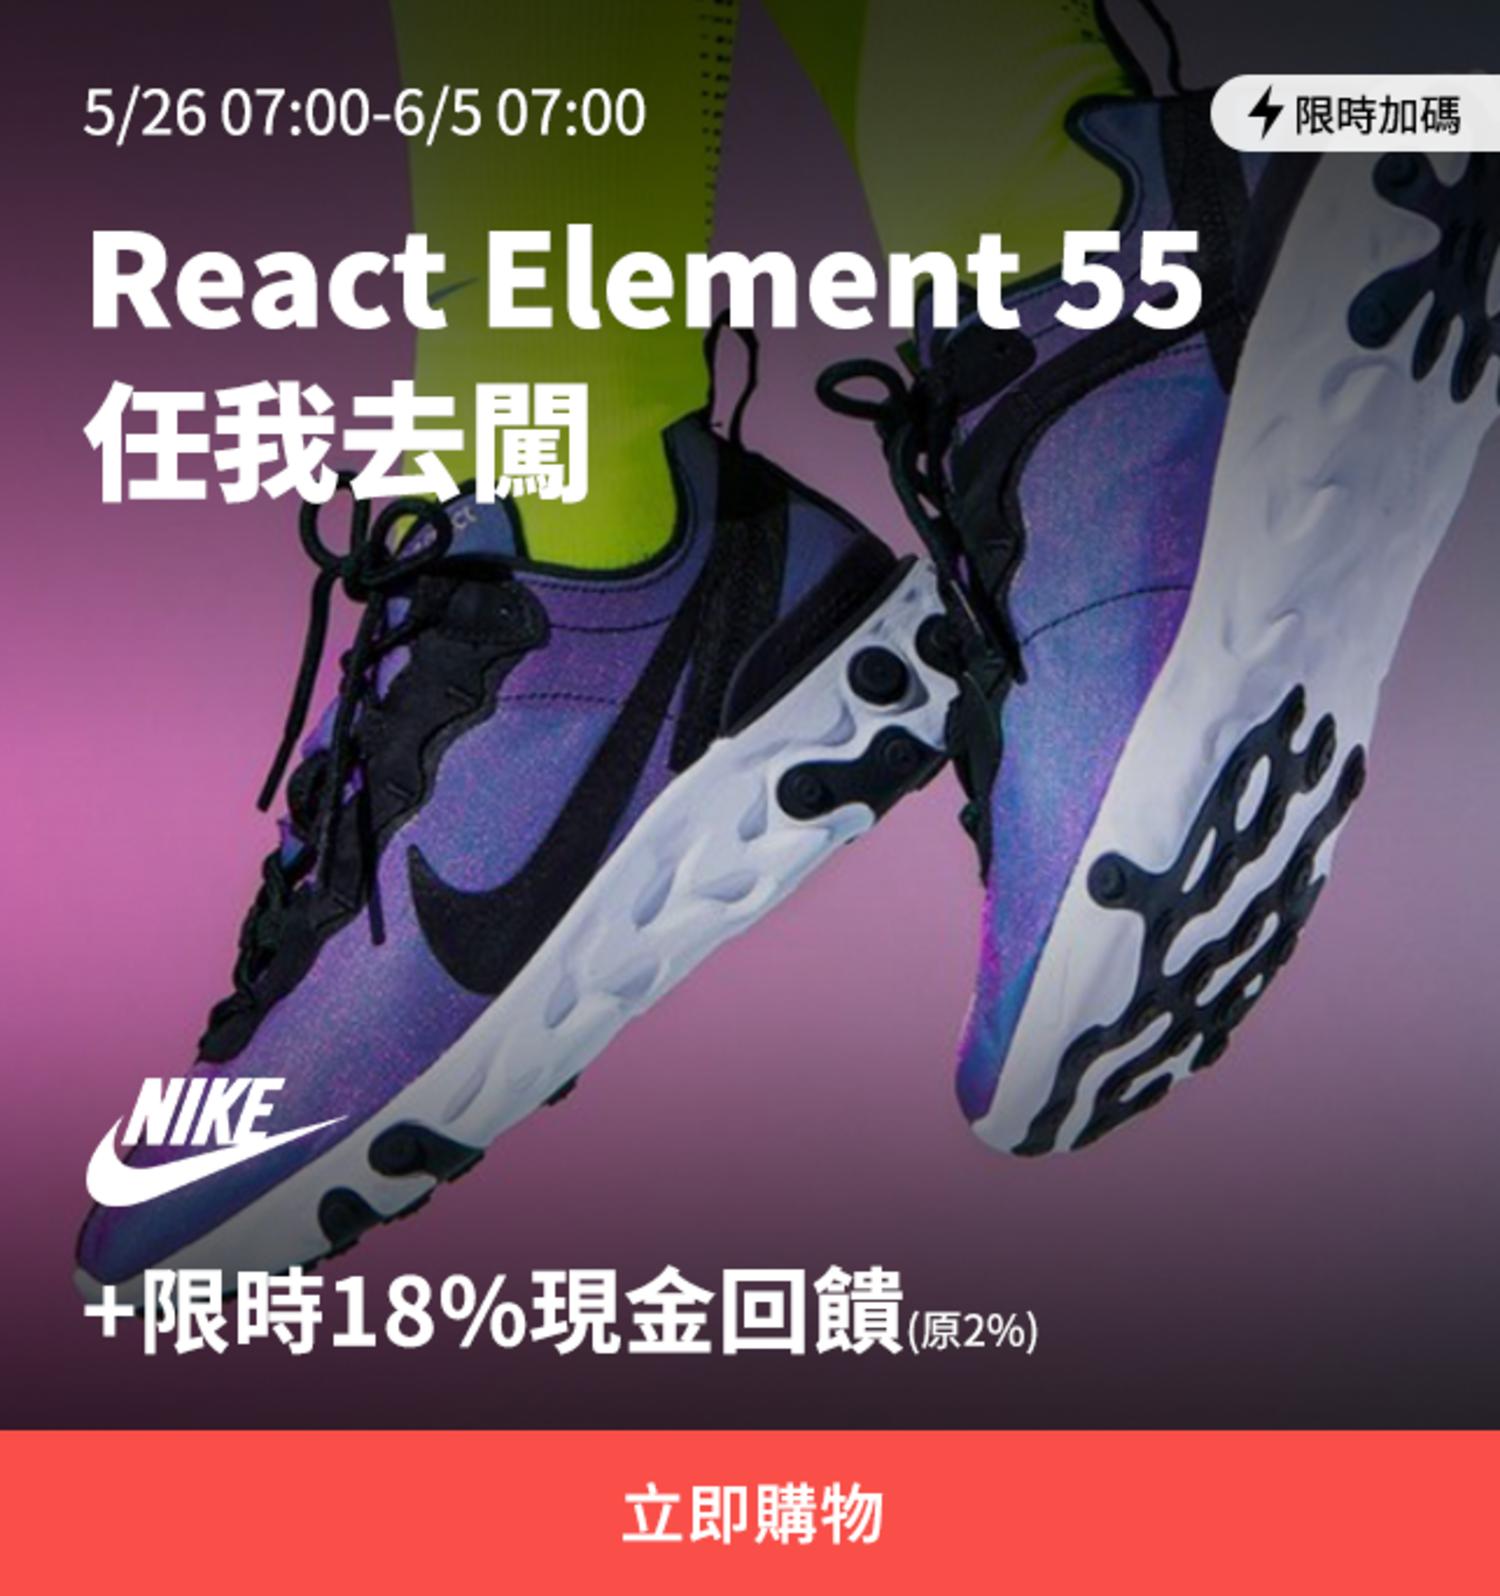 Nike 加碼 -0605 7am